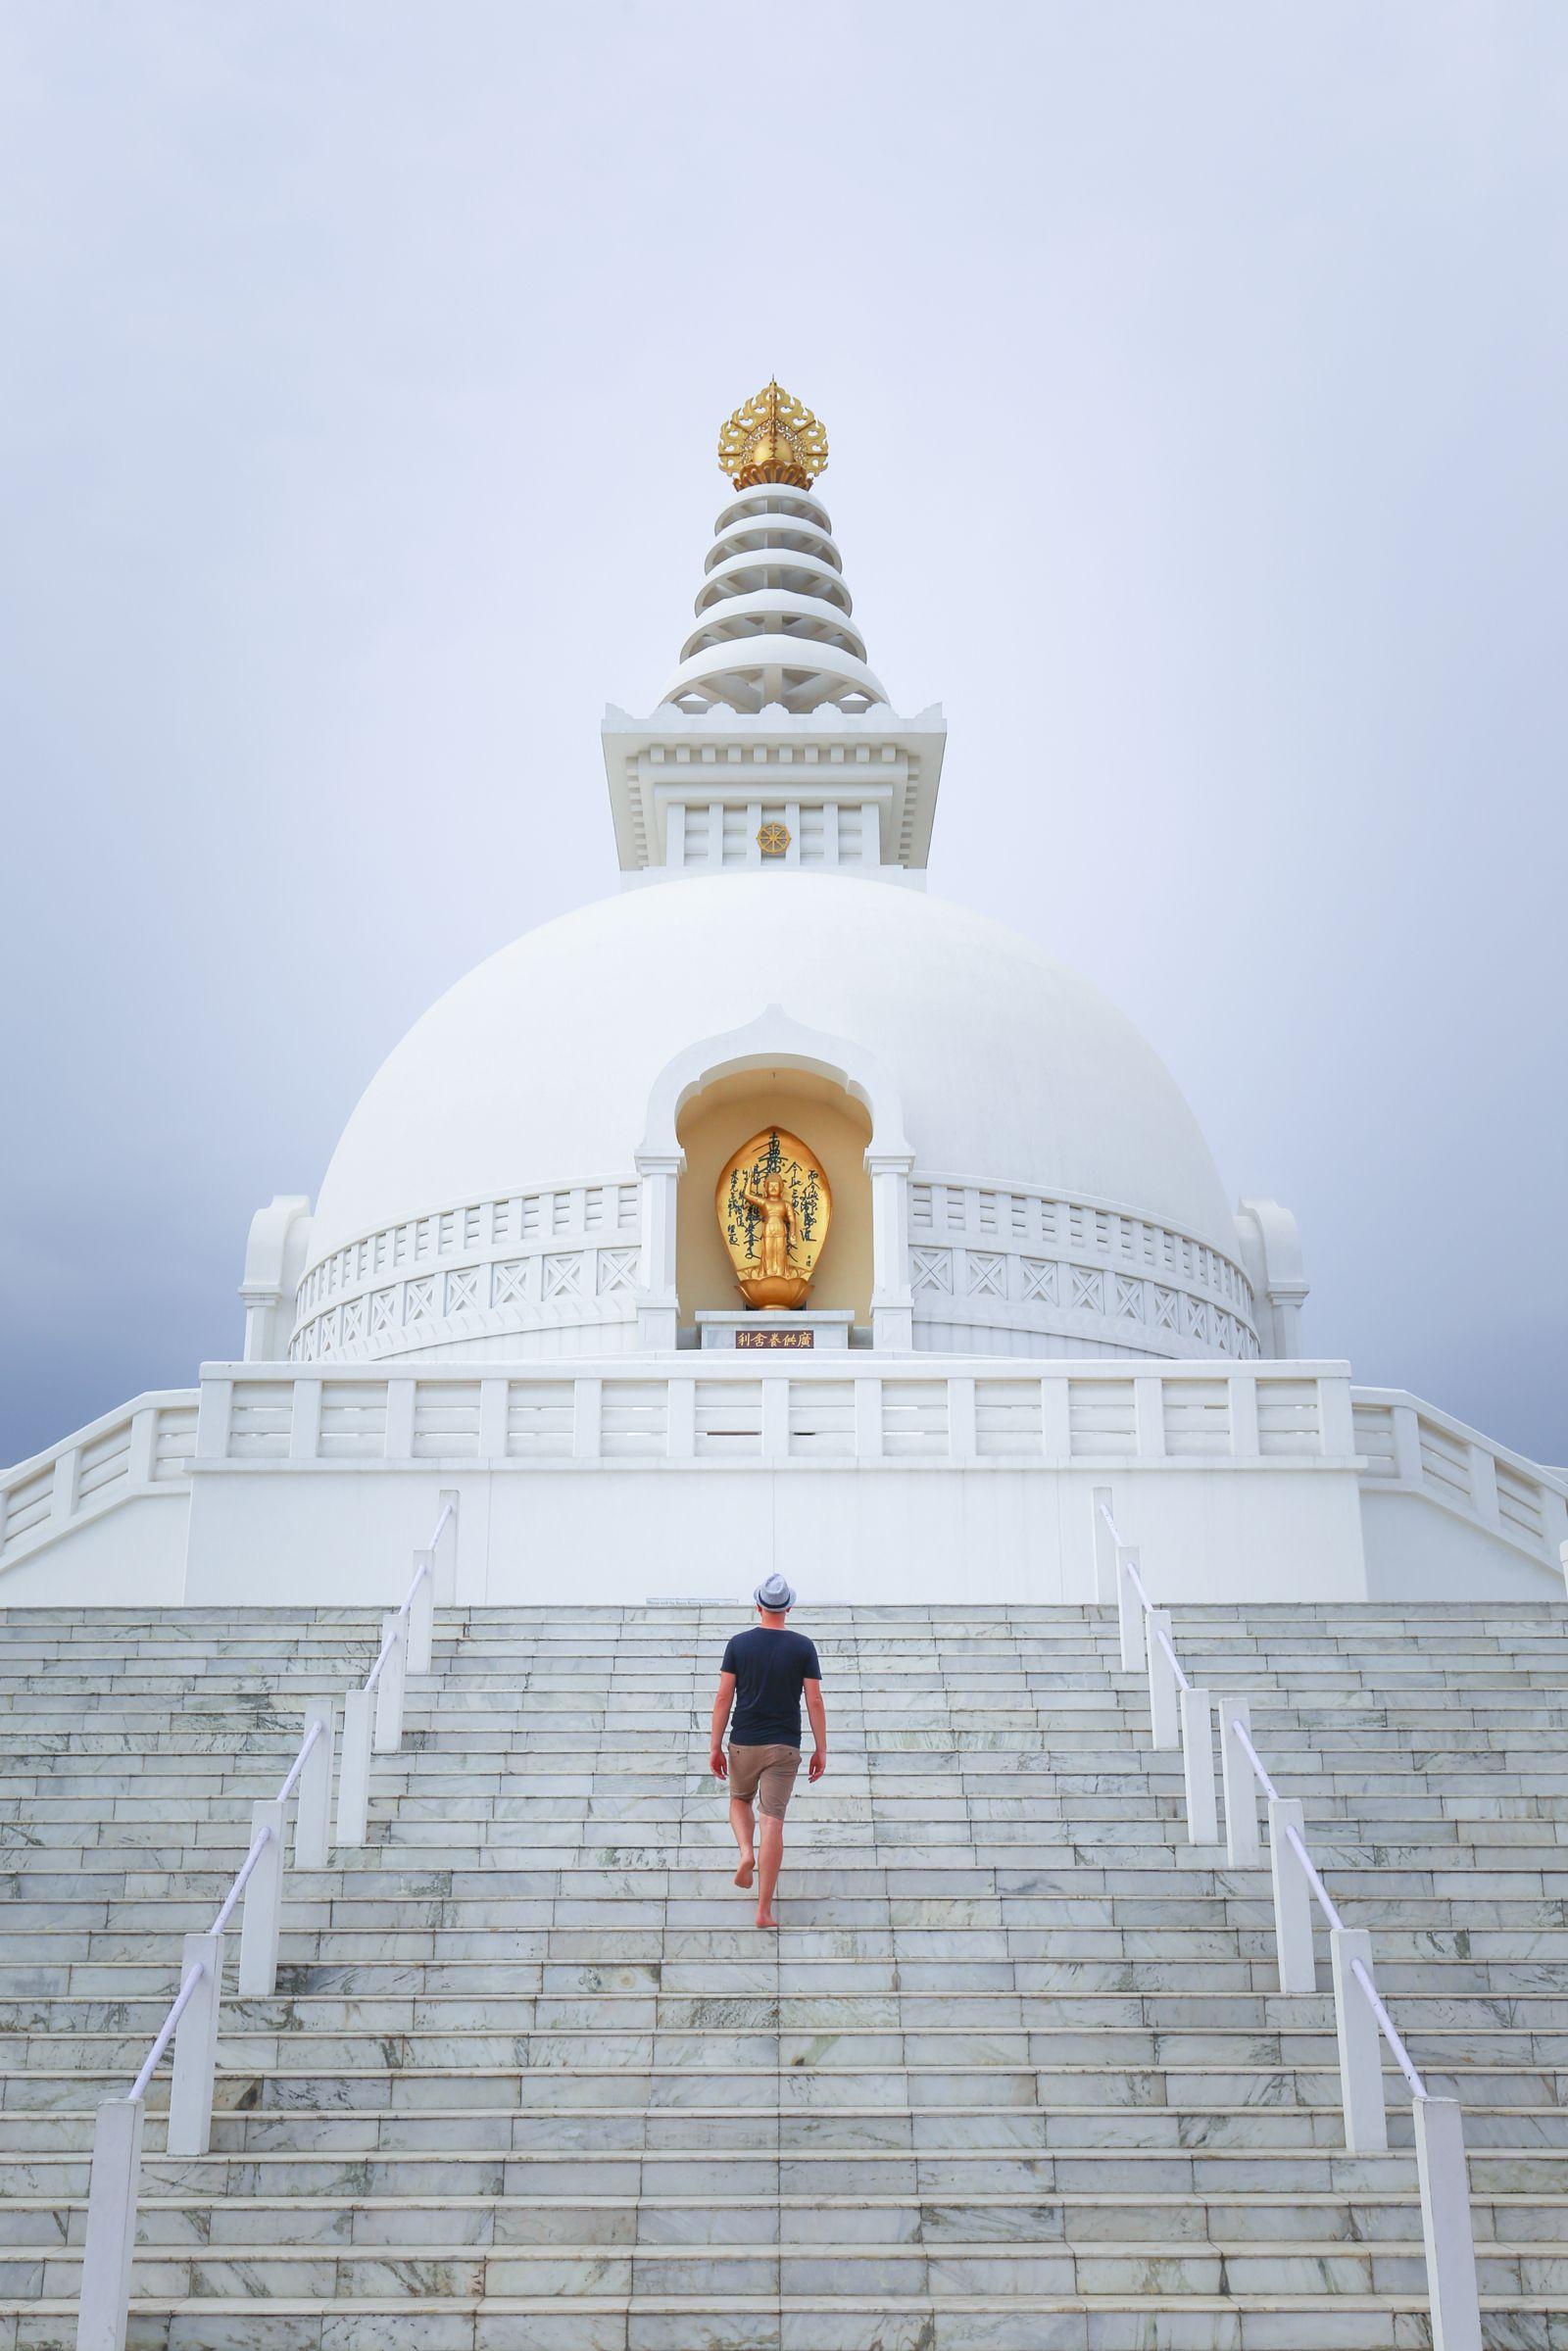 Photos And Postcards From Nepal... Chitwan, Kathmandu, Bhaktapur, Panauti, Pokhara, Tansen, Palpa, Lumbini (29)